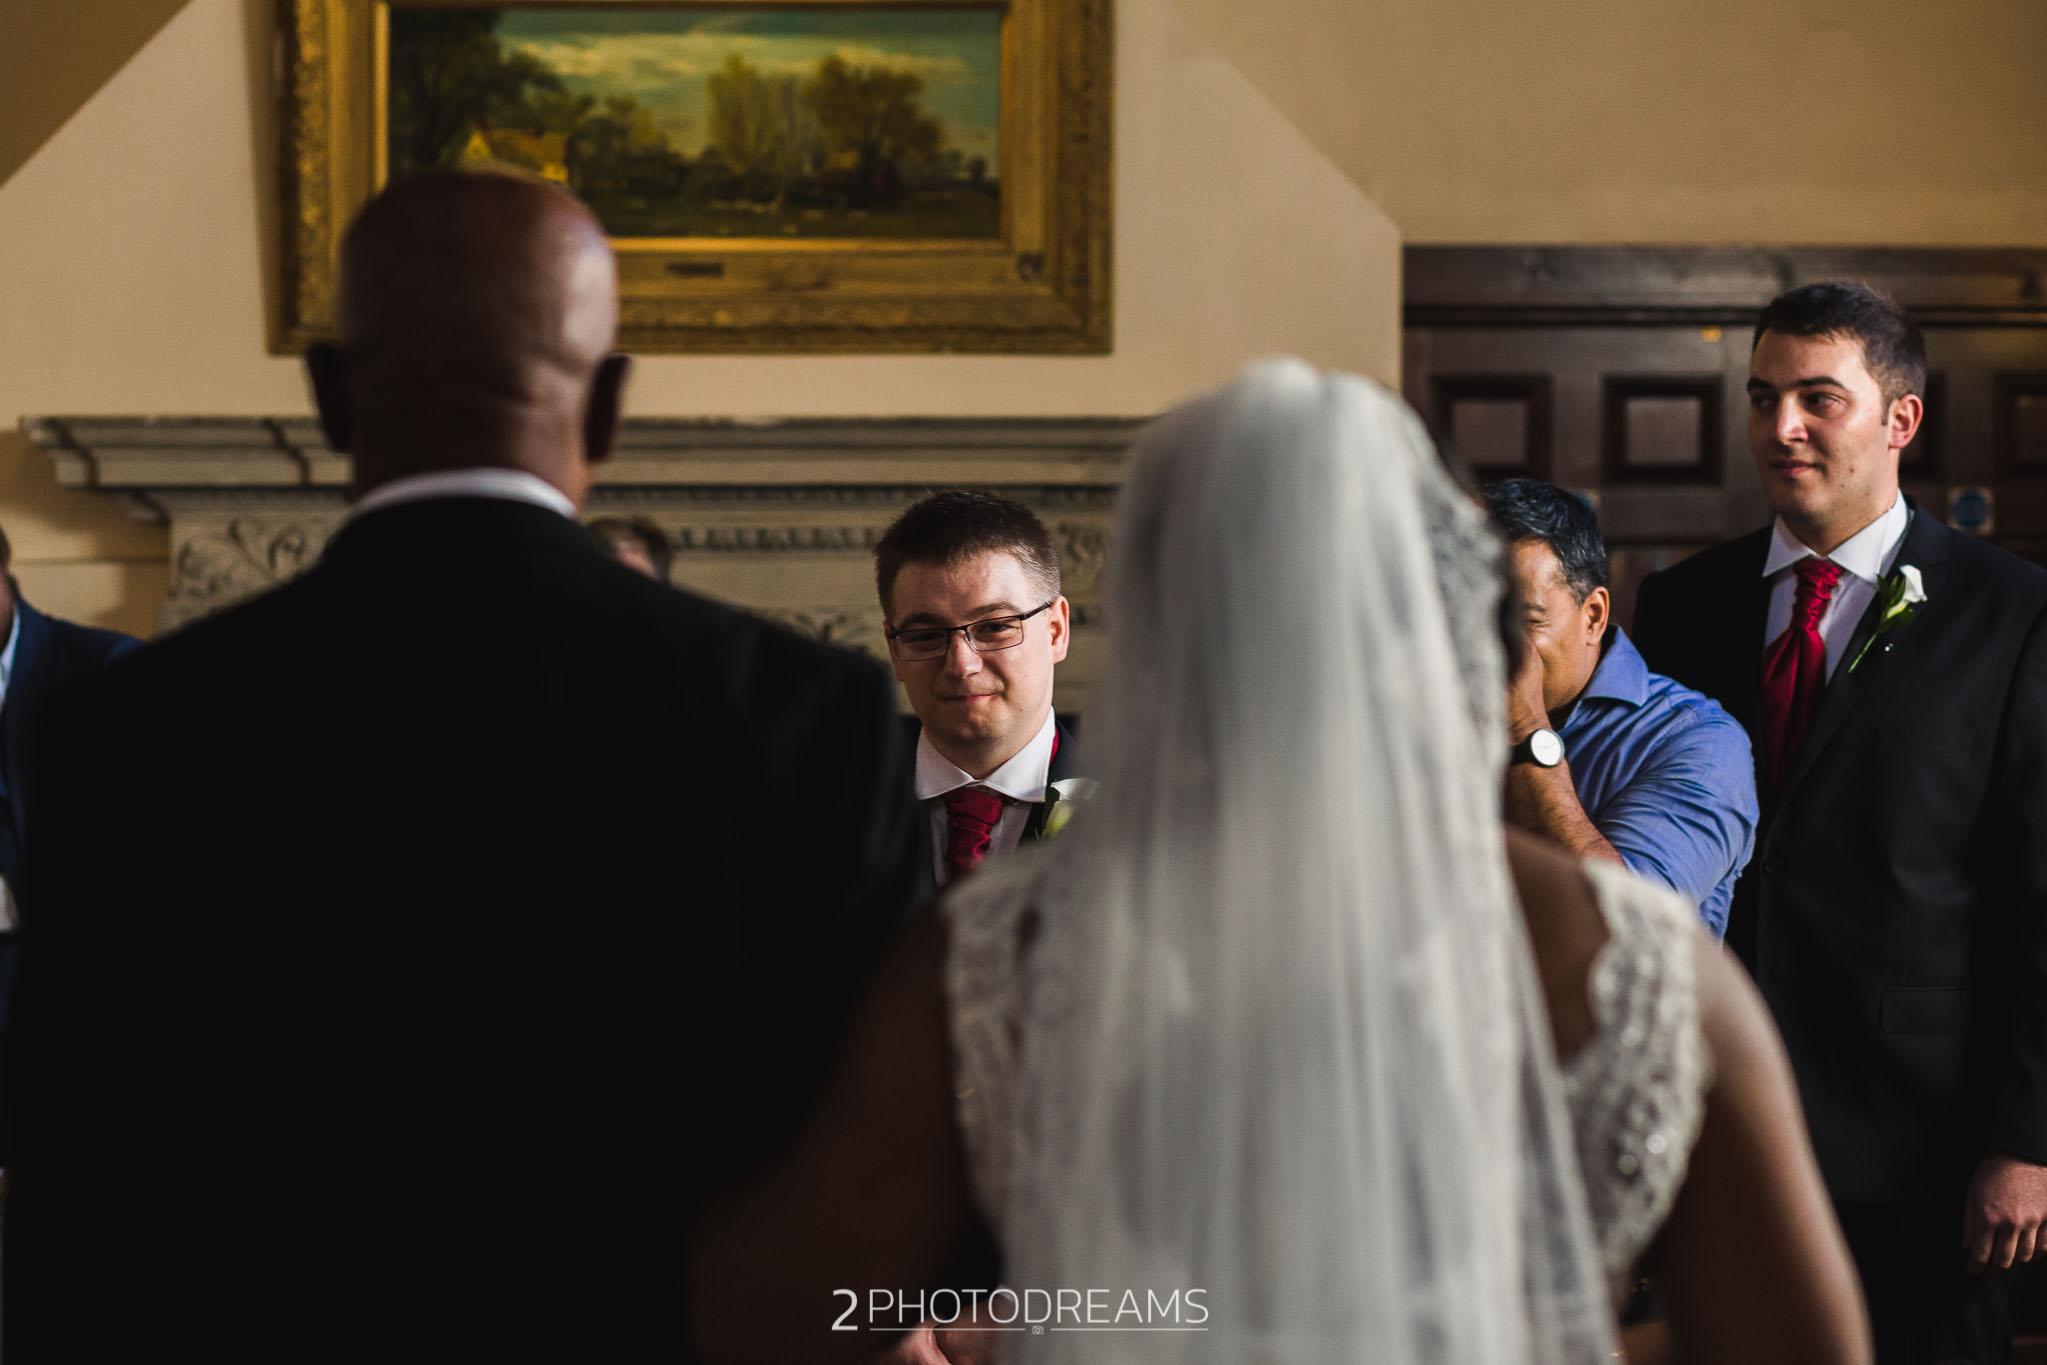 Dunston Hall Wedding Photographer Norwich